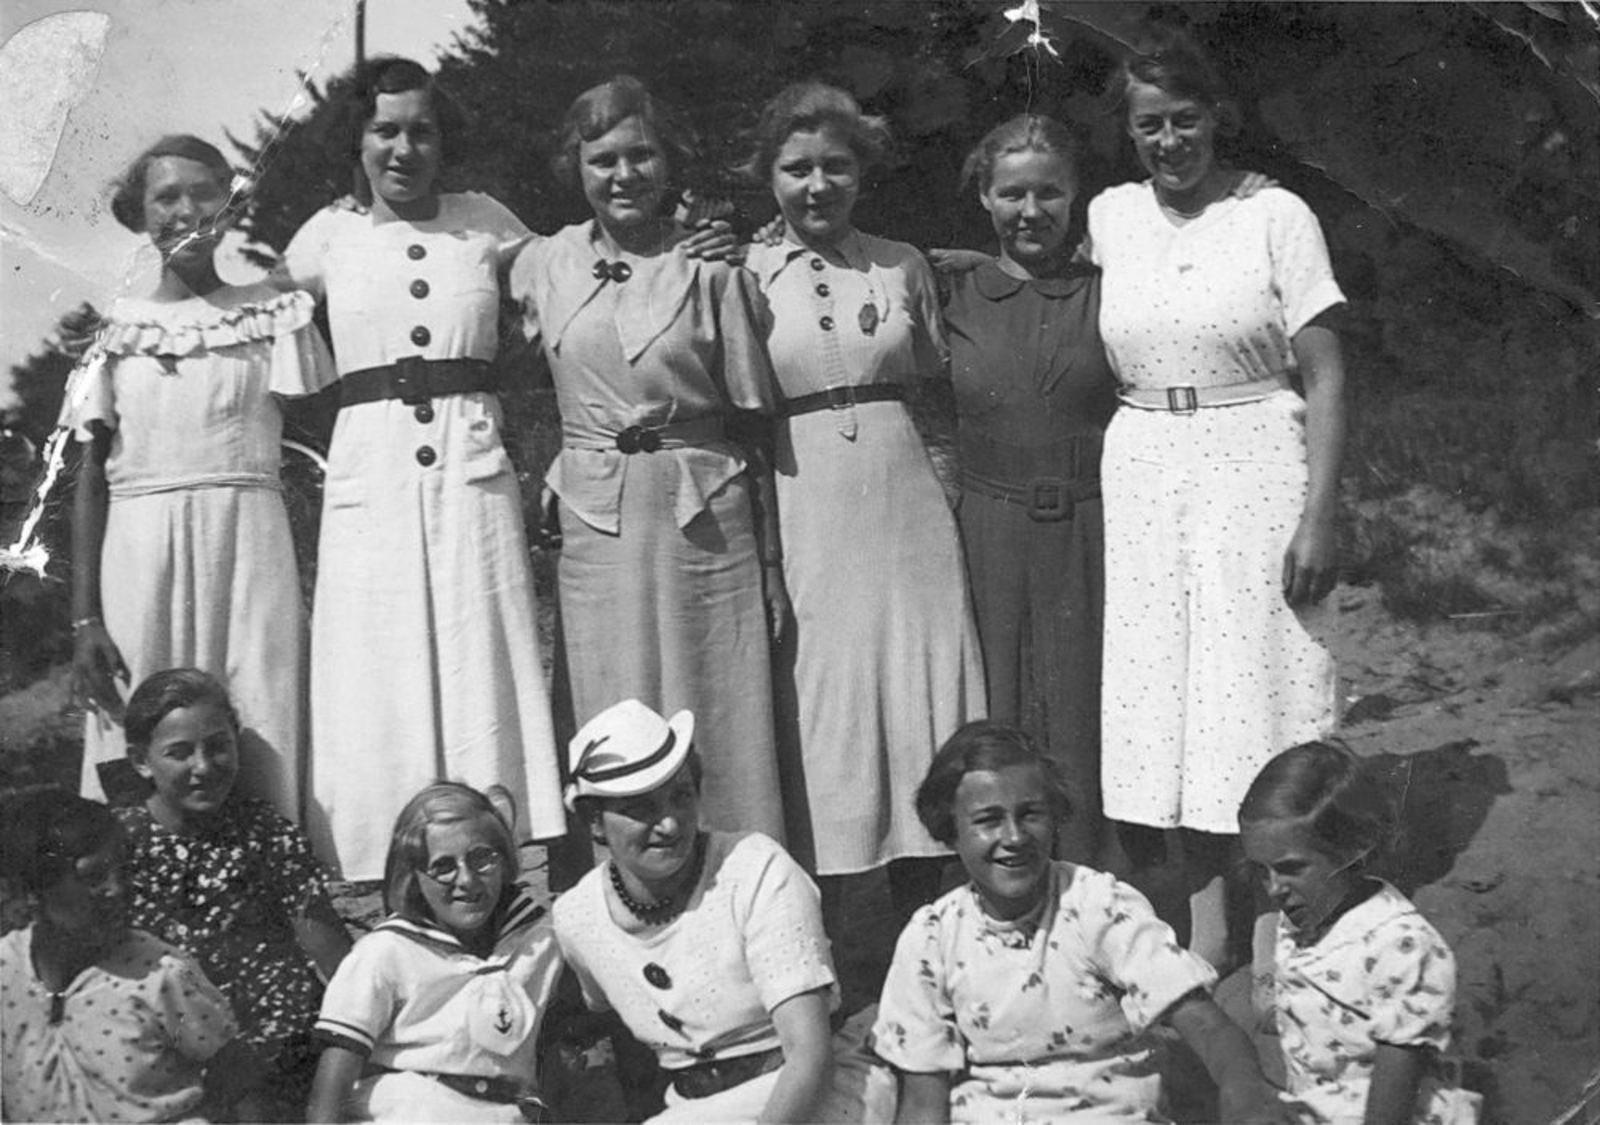 Meisjes Vereniging IJweg Gebouwtje v Brouwer 1935 02